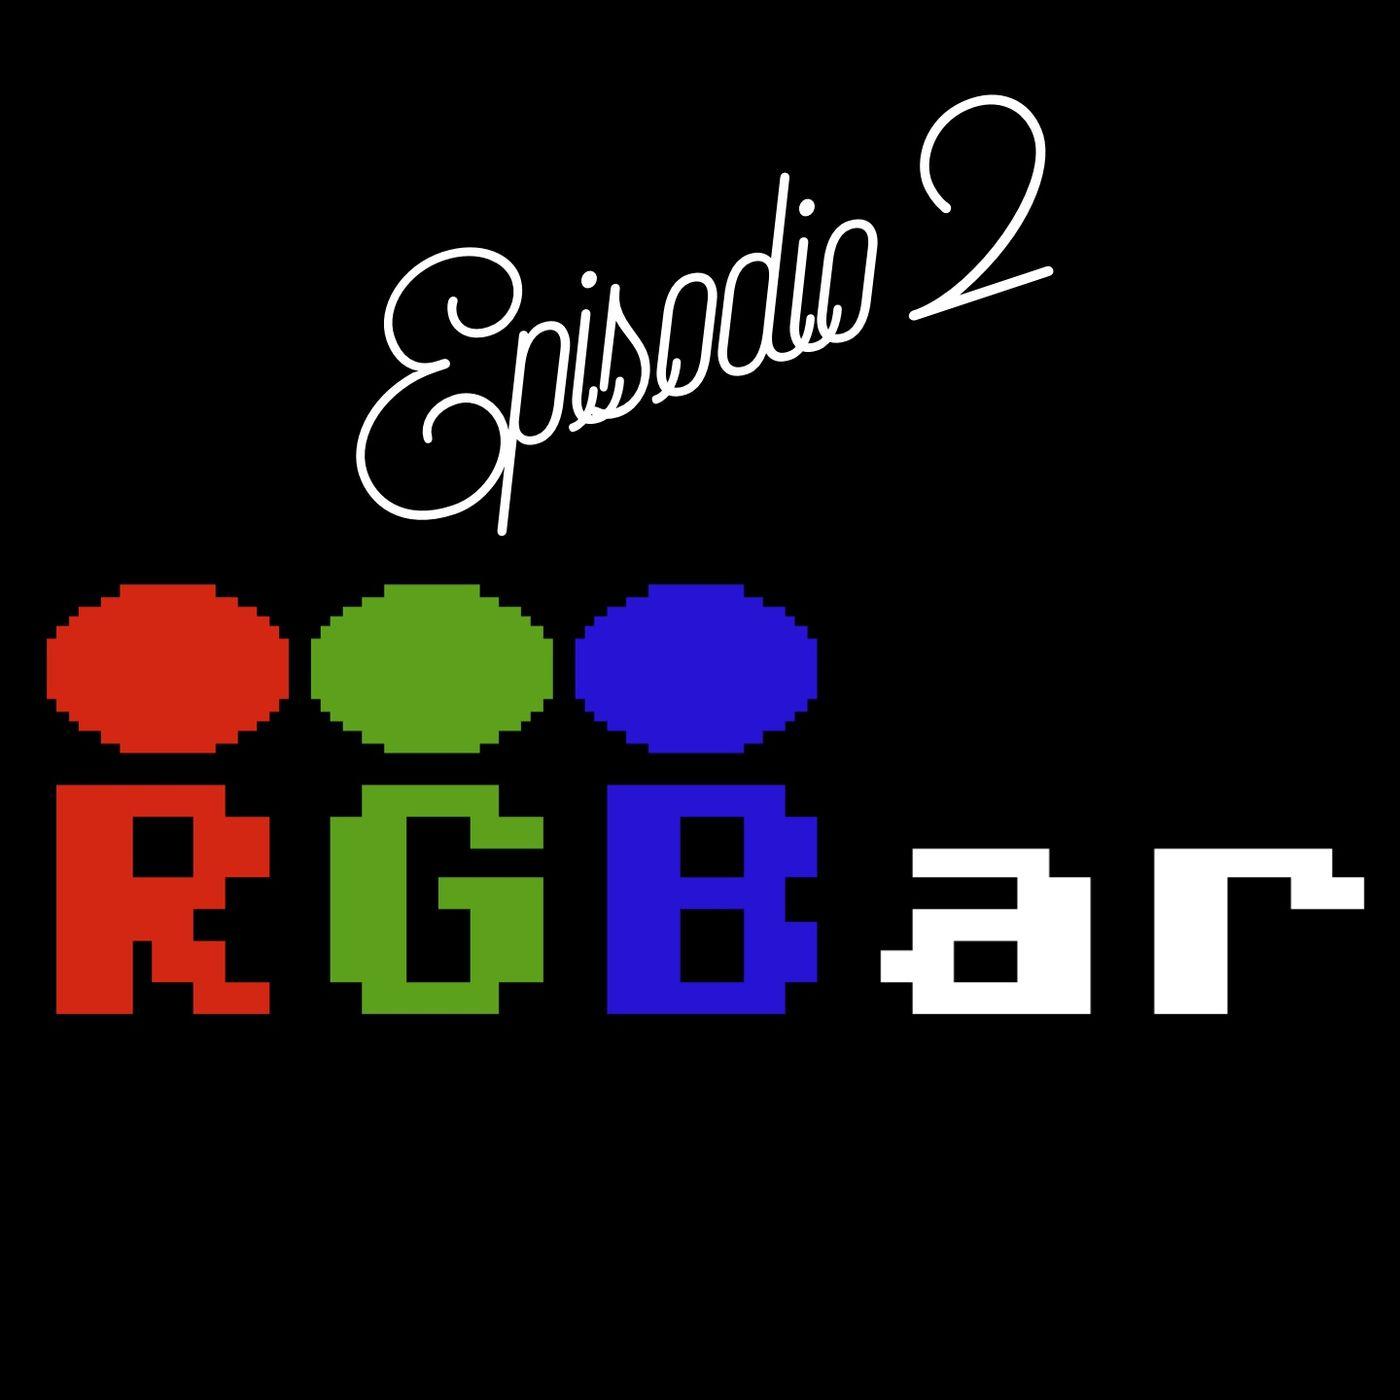 RGBar - Episodio 2